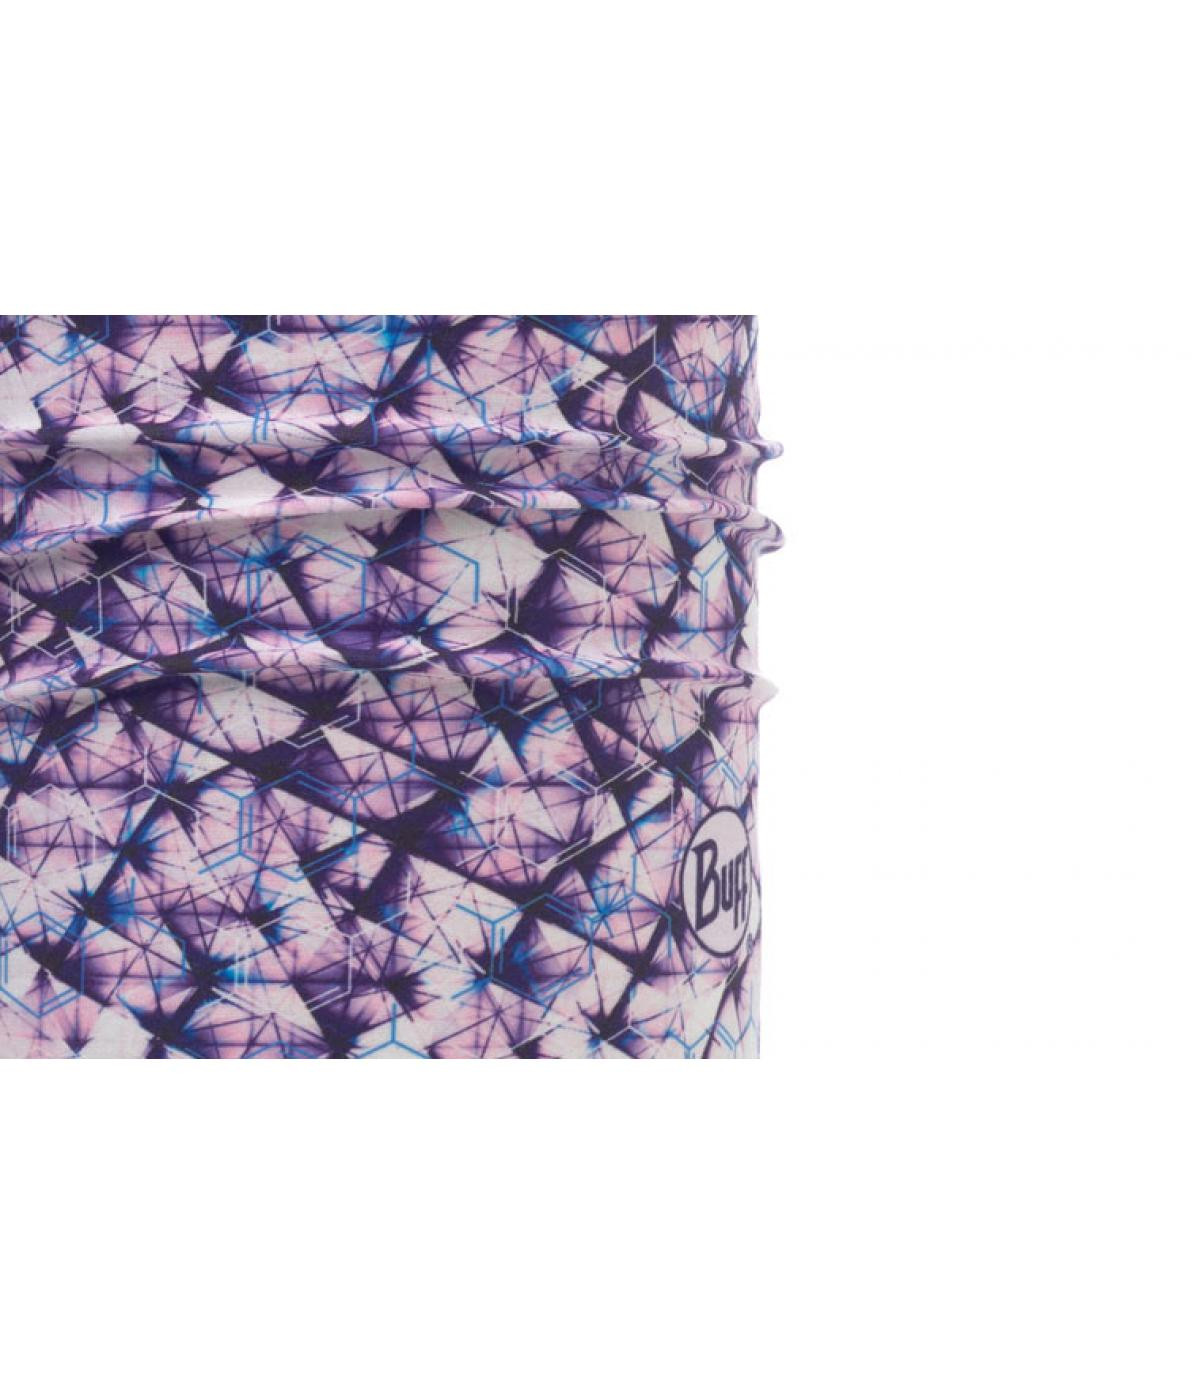 Detalles Perform Adren purple lilac imagen 2